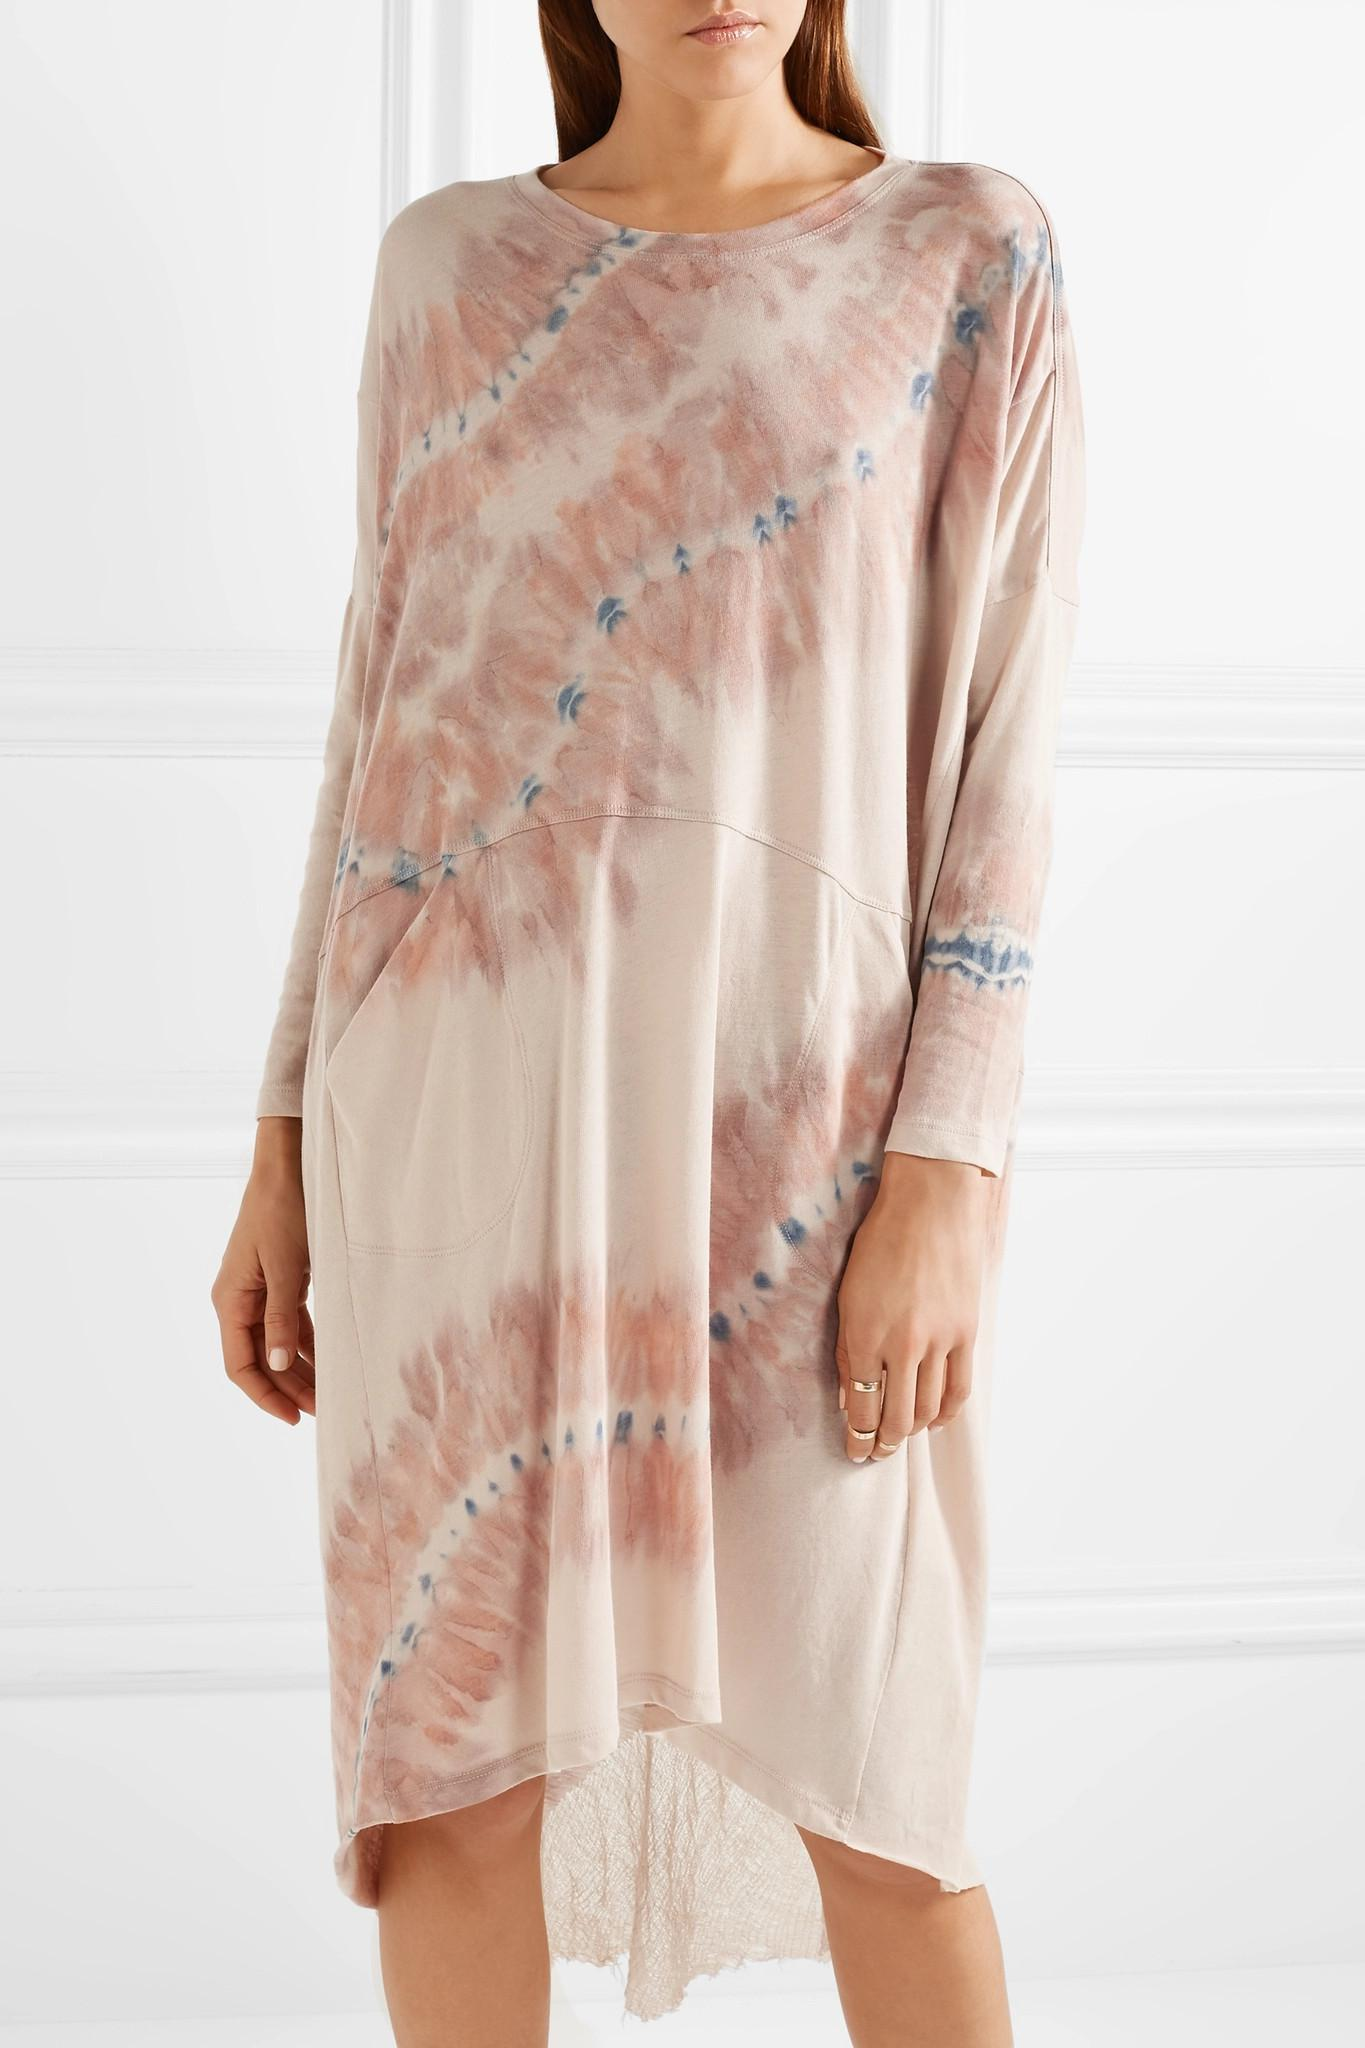 Oversized Tie-dyed Cotton-blend Jersey Dress - Neutral Raquel Allegra Buy Cheap Footlocker Finishline Discount Latest Amazon Perfect Sale Online Reliable Cheap Online 0vEPkgY